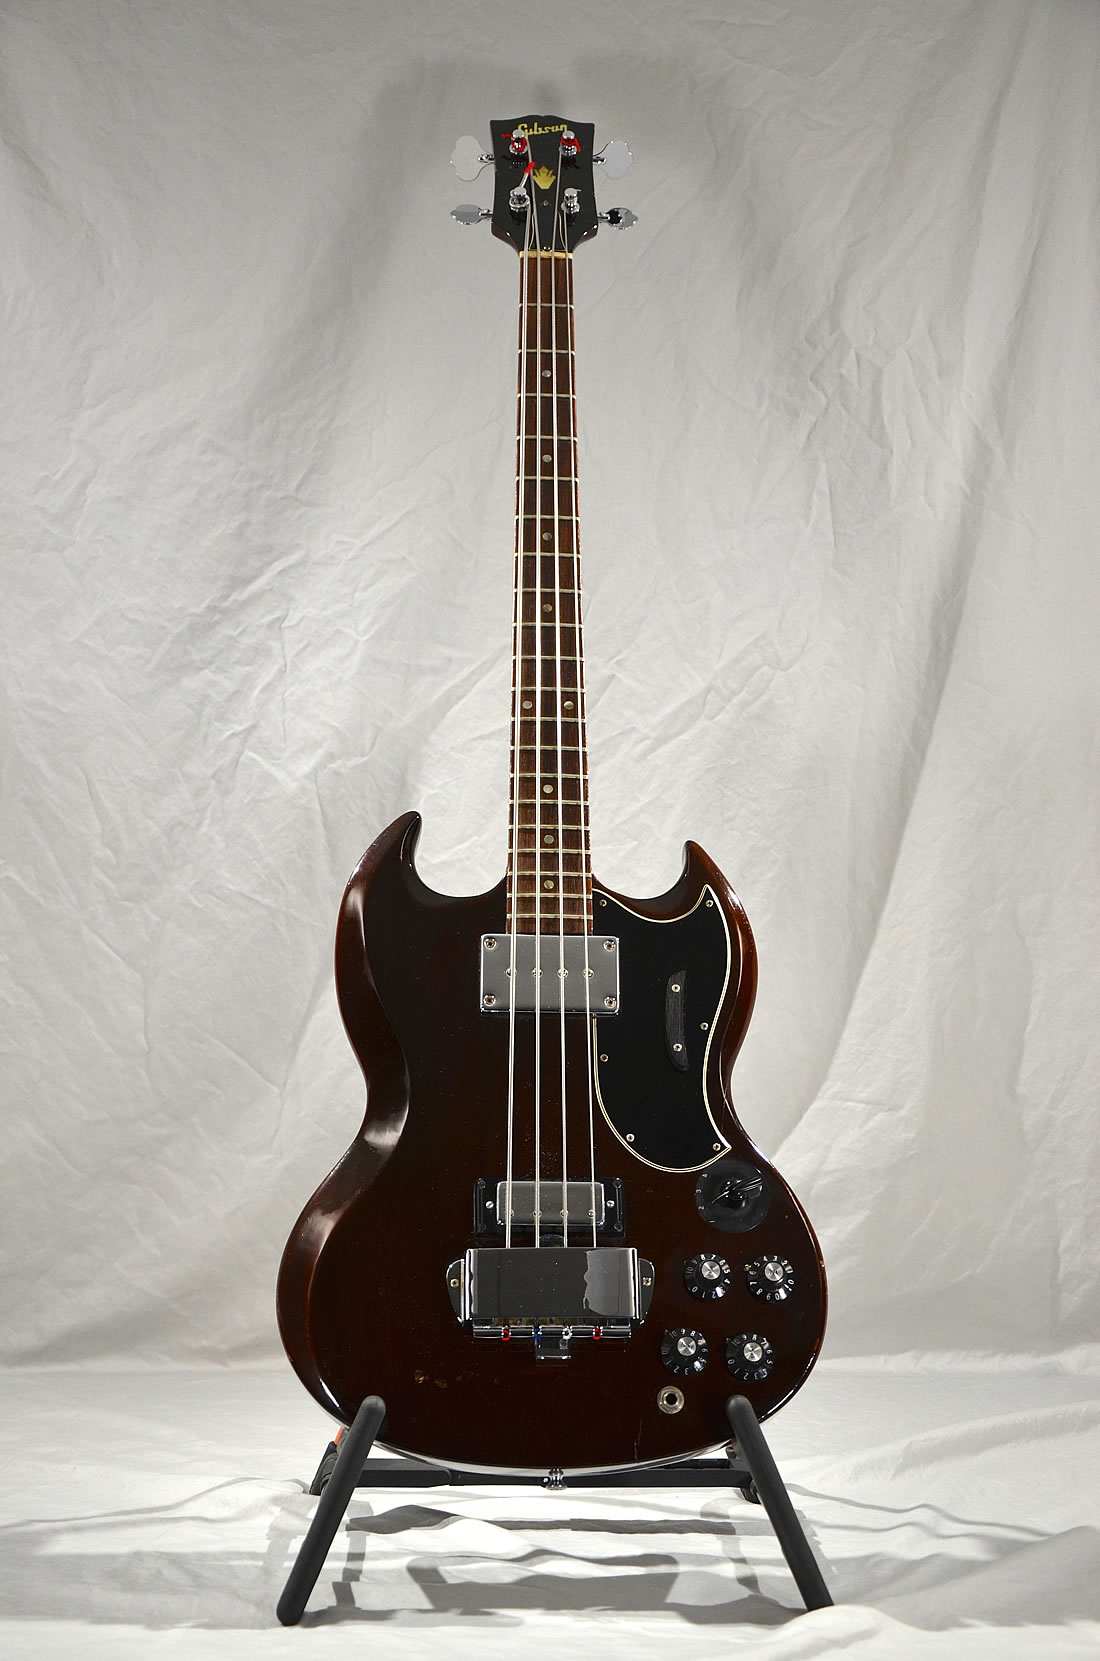 1969 Gibson EB-3 Bass Guitar